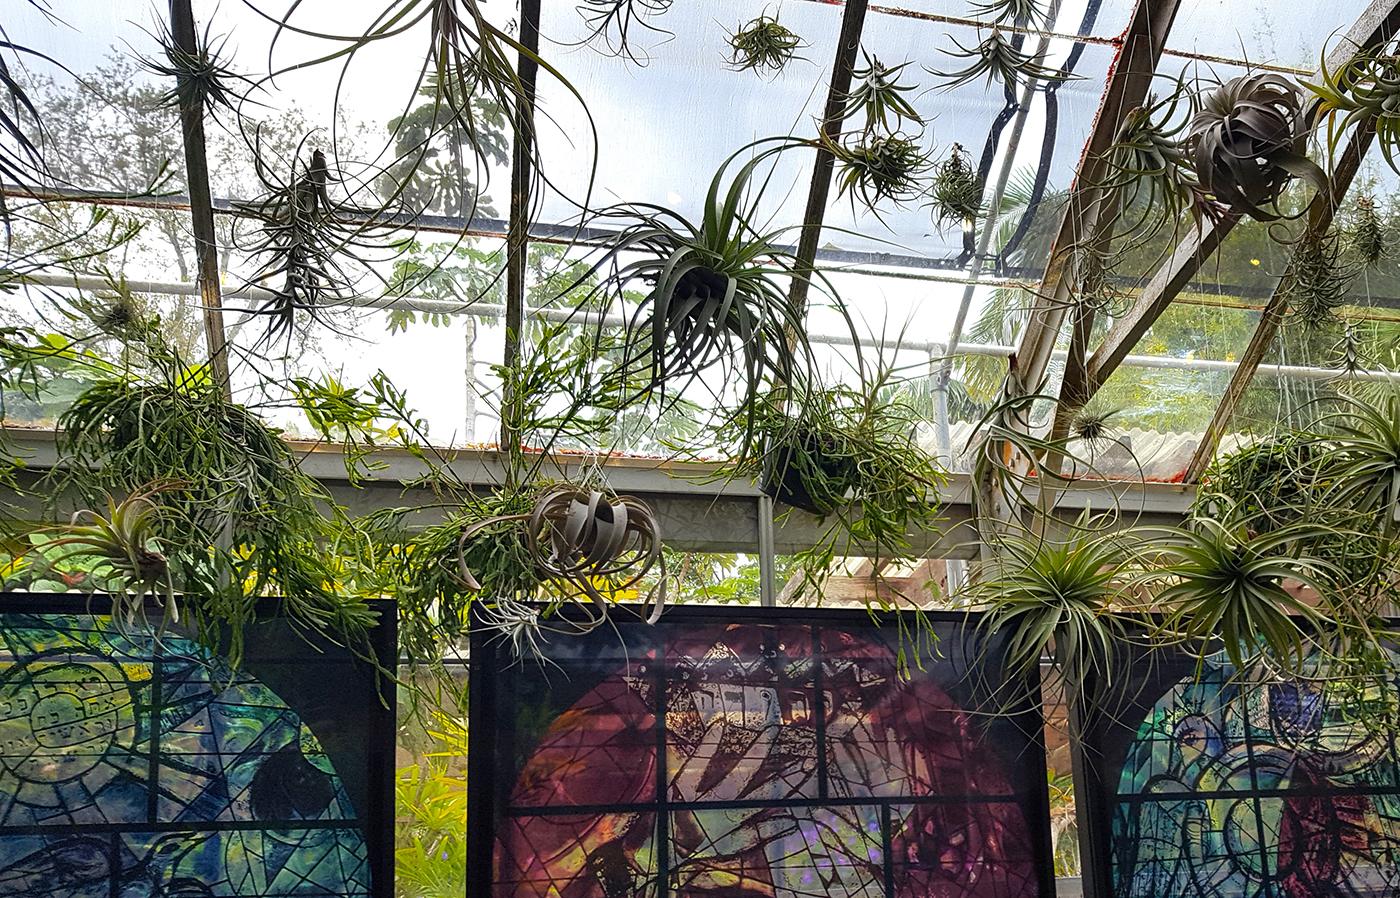 A Botanical Garden Blooms with Chagall Artes & contextos Selby11